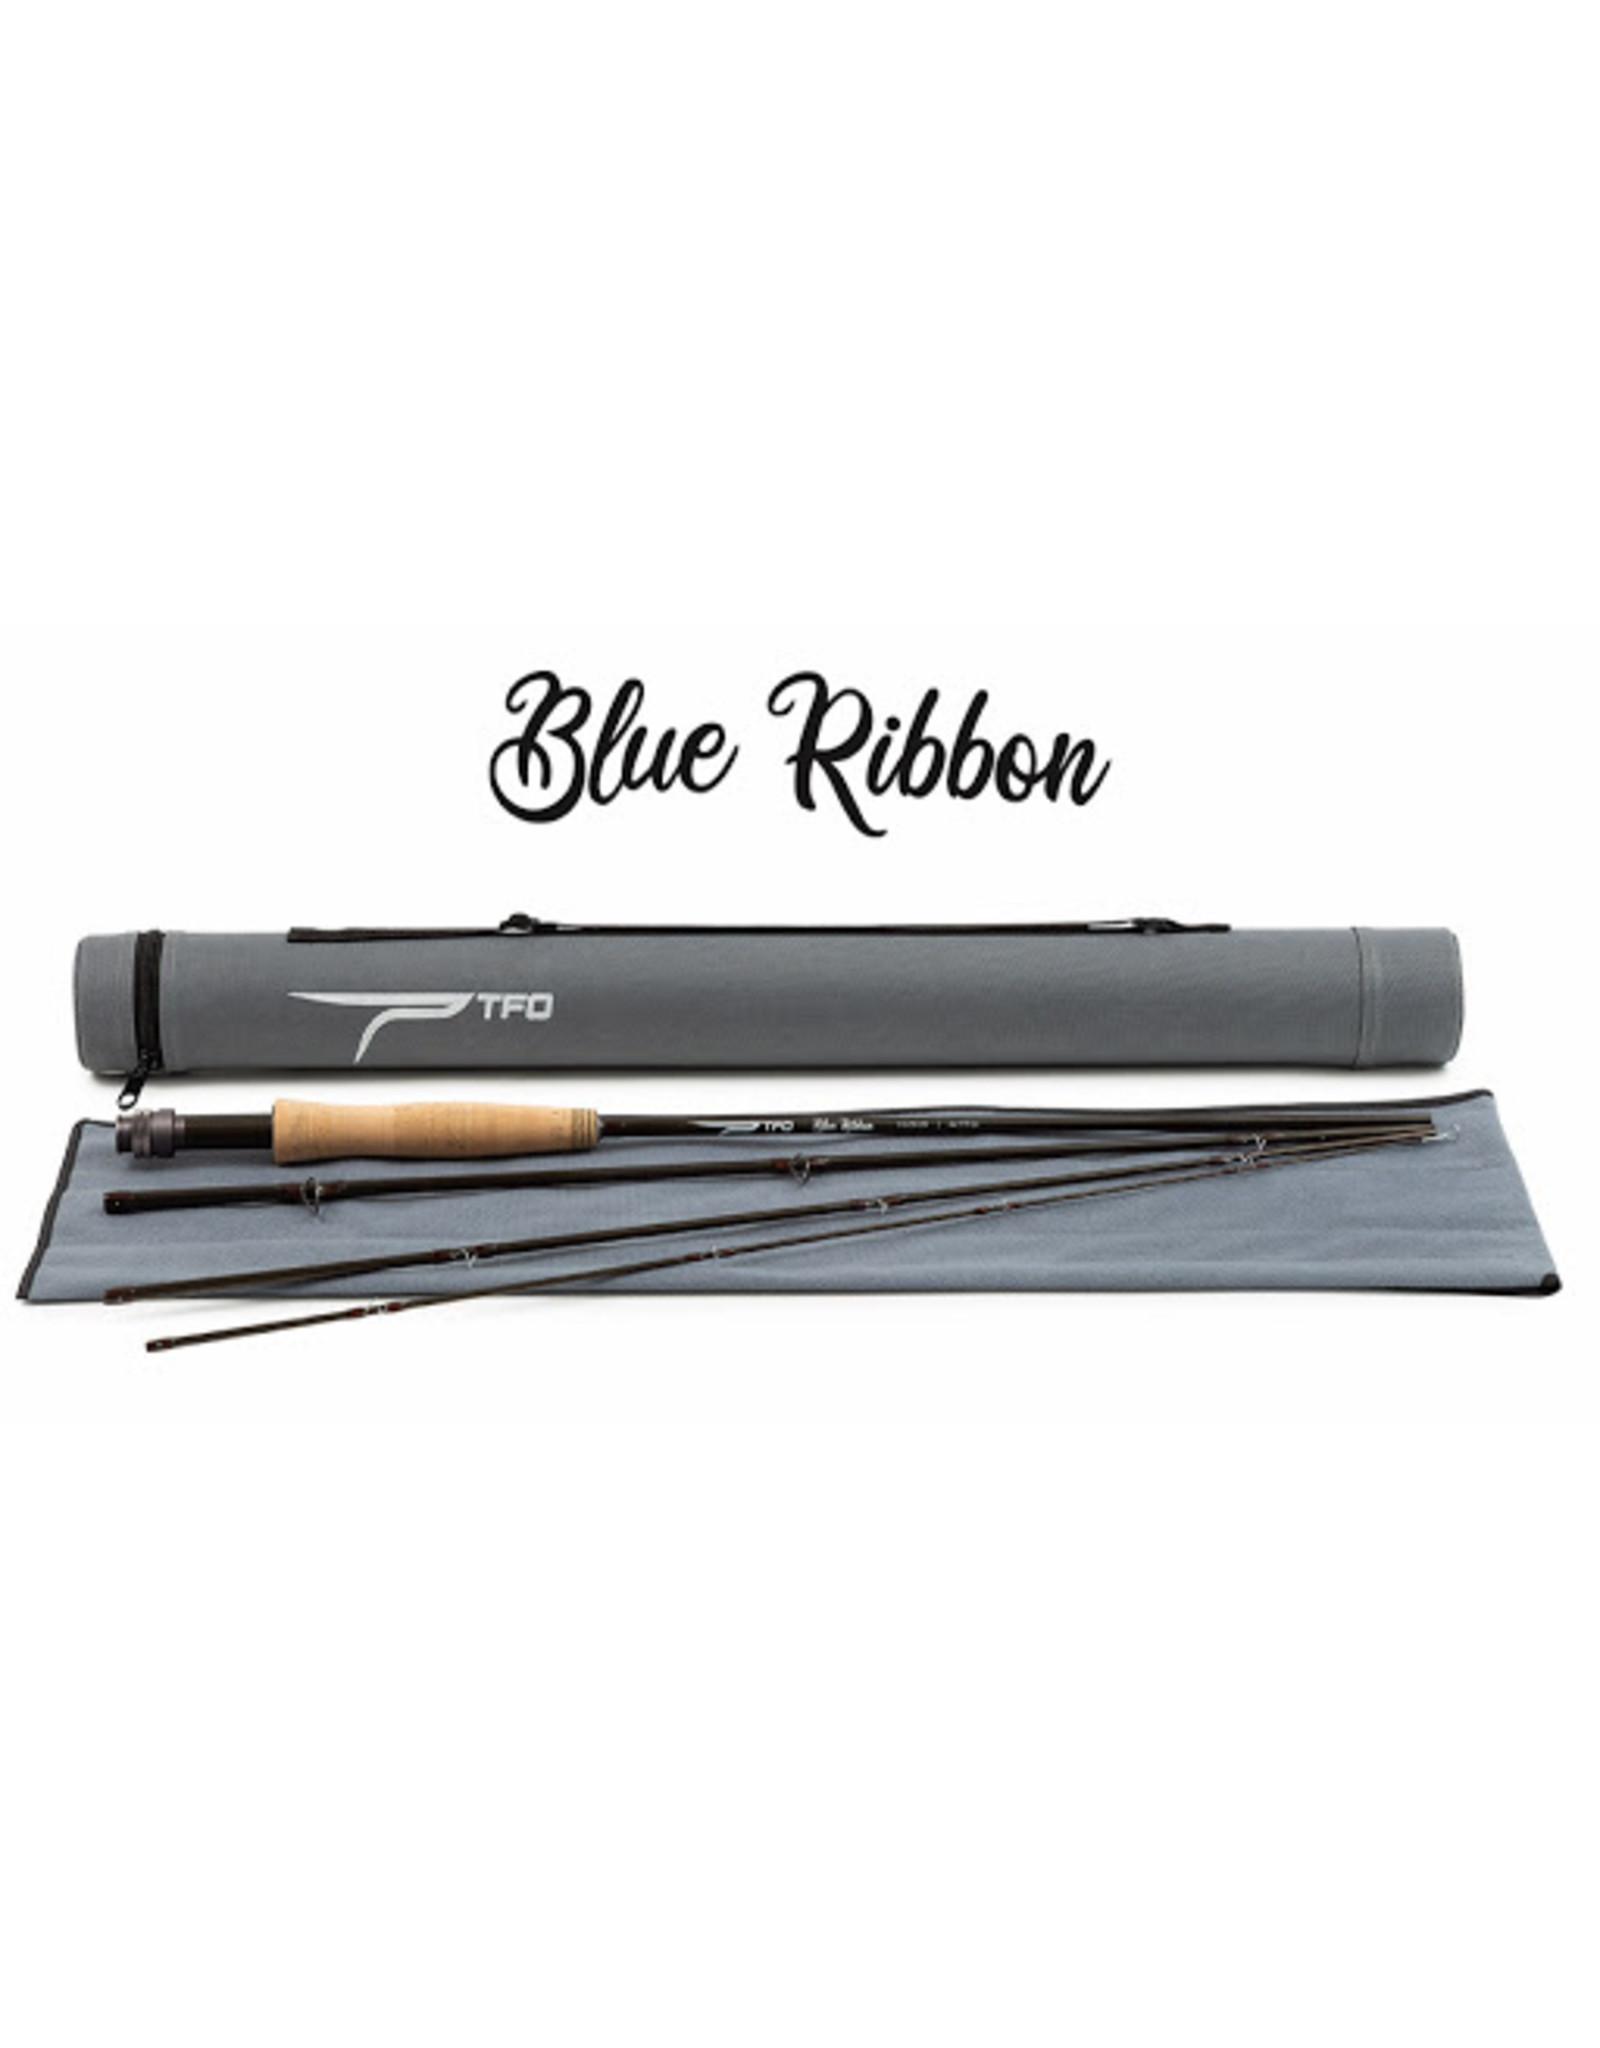 Temple Fork TFO - Blue Ribbon Fly Rod w/ Case